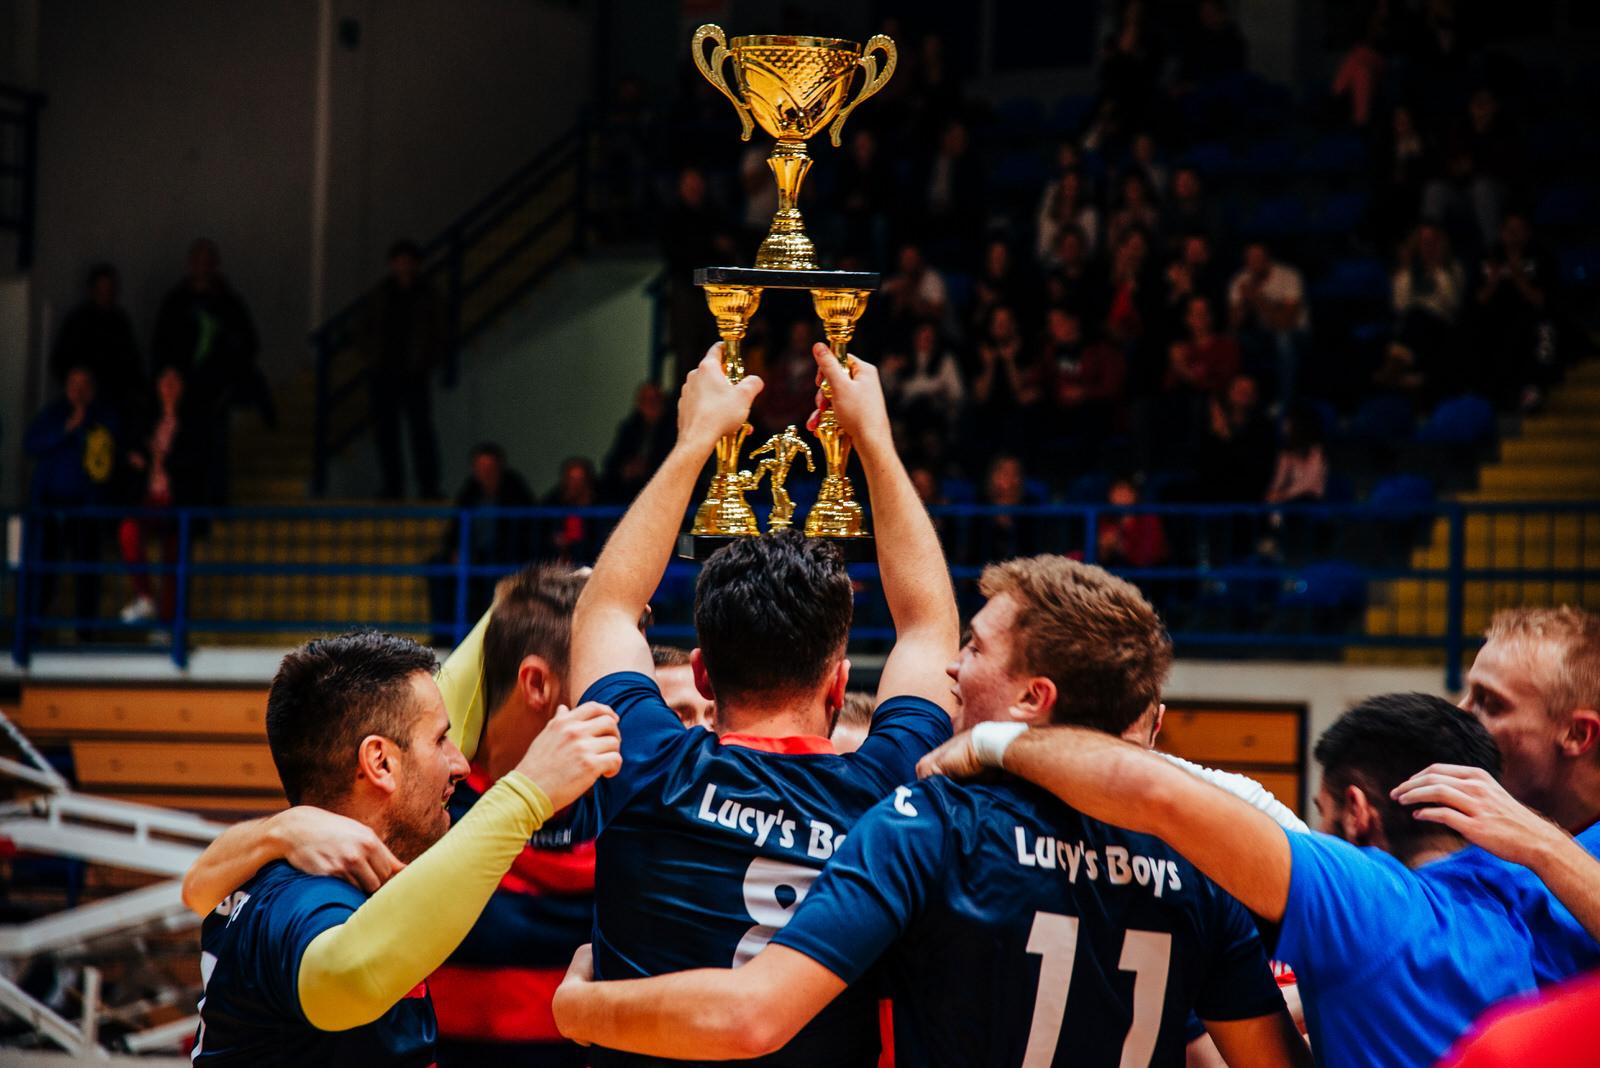 likaclub_zimska-malonogometna-liga-gospić_2019-20-140